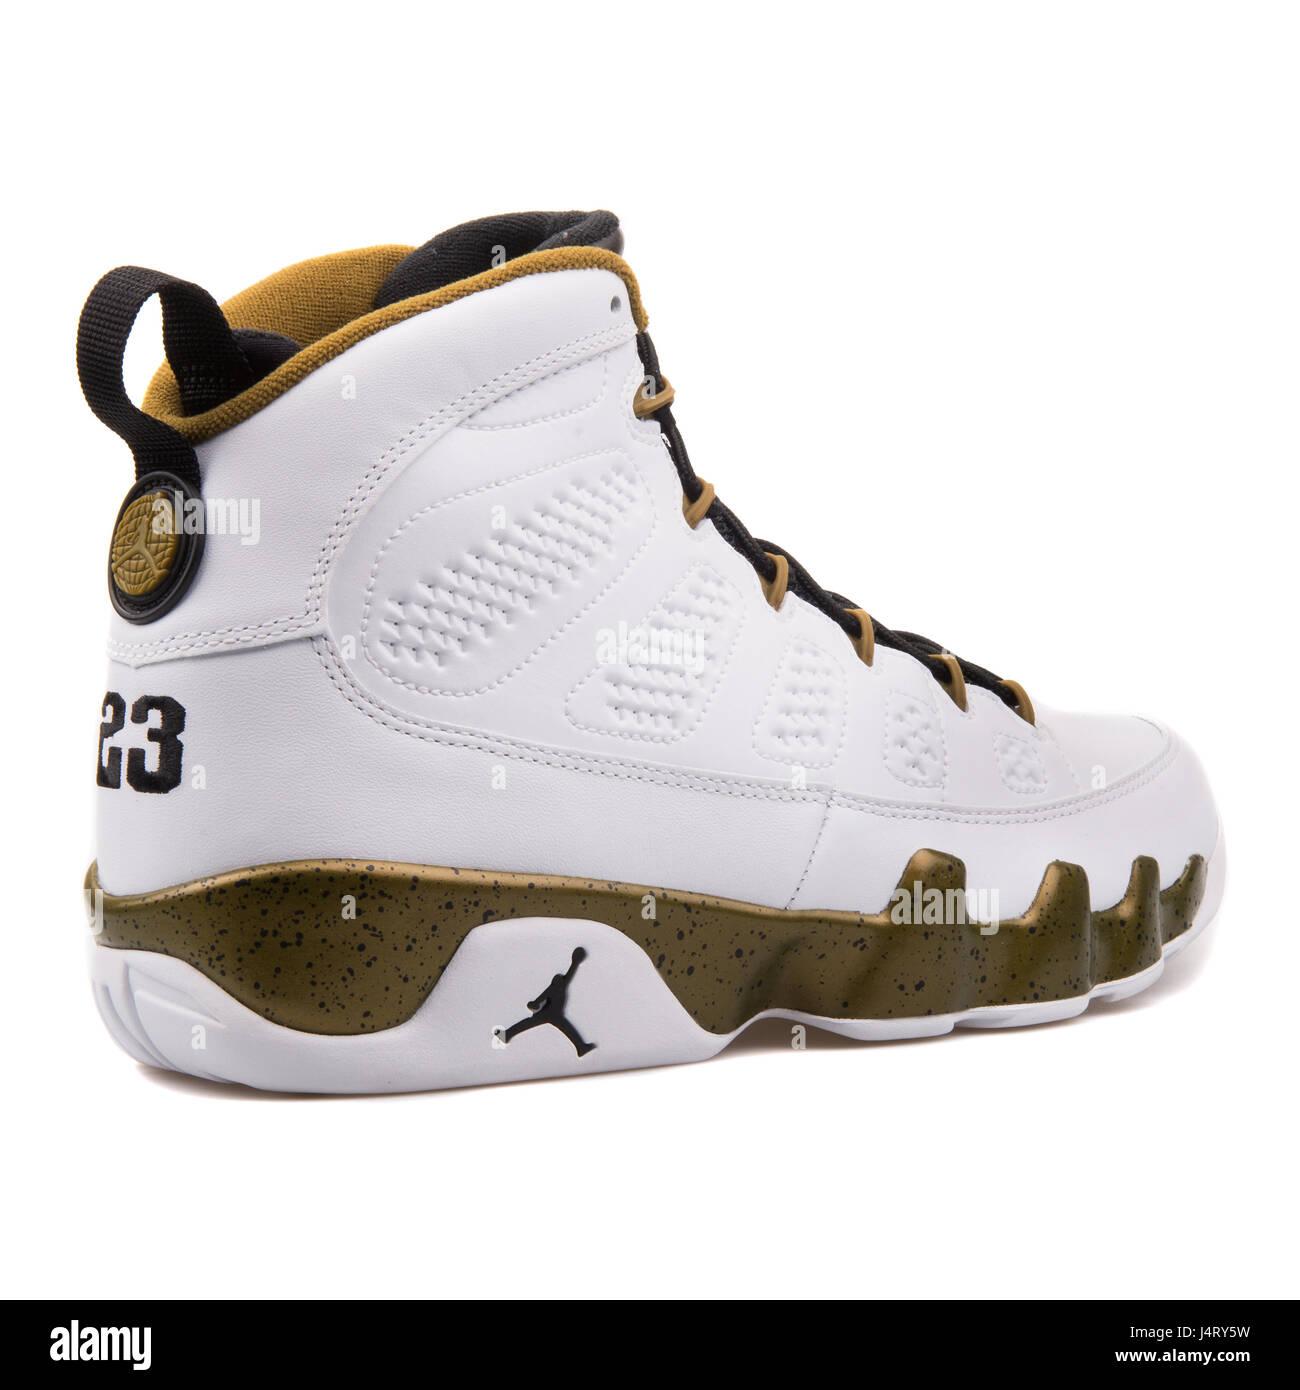 the latest 029e5 fa218 Nike Air Jordan 9 Retro-weiße schwarze Miliz grün hohe Leder-Sneakers -  302370-109